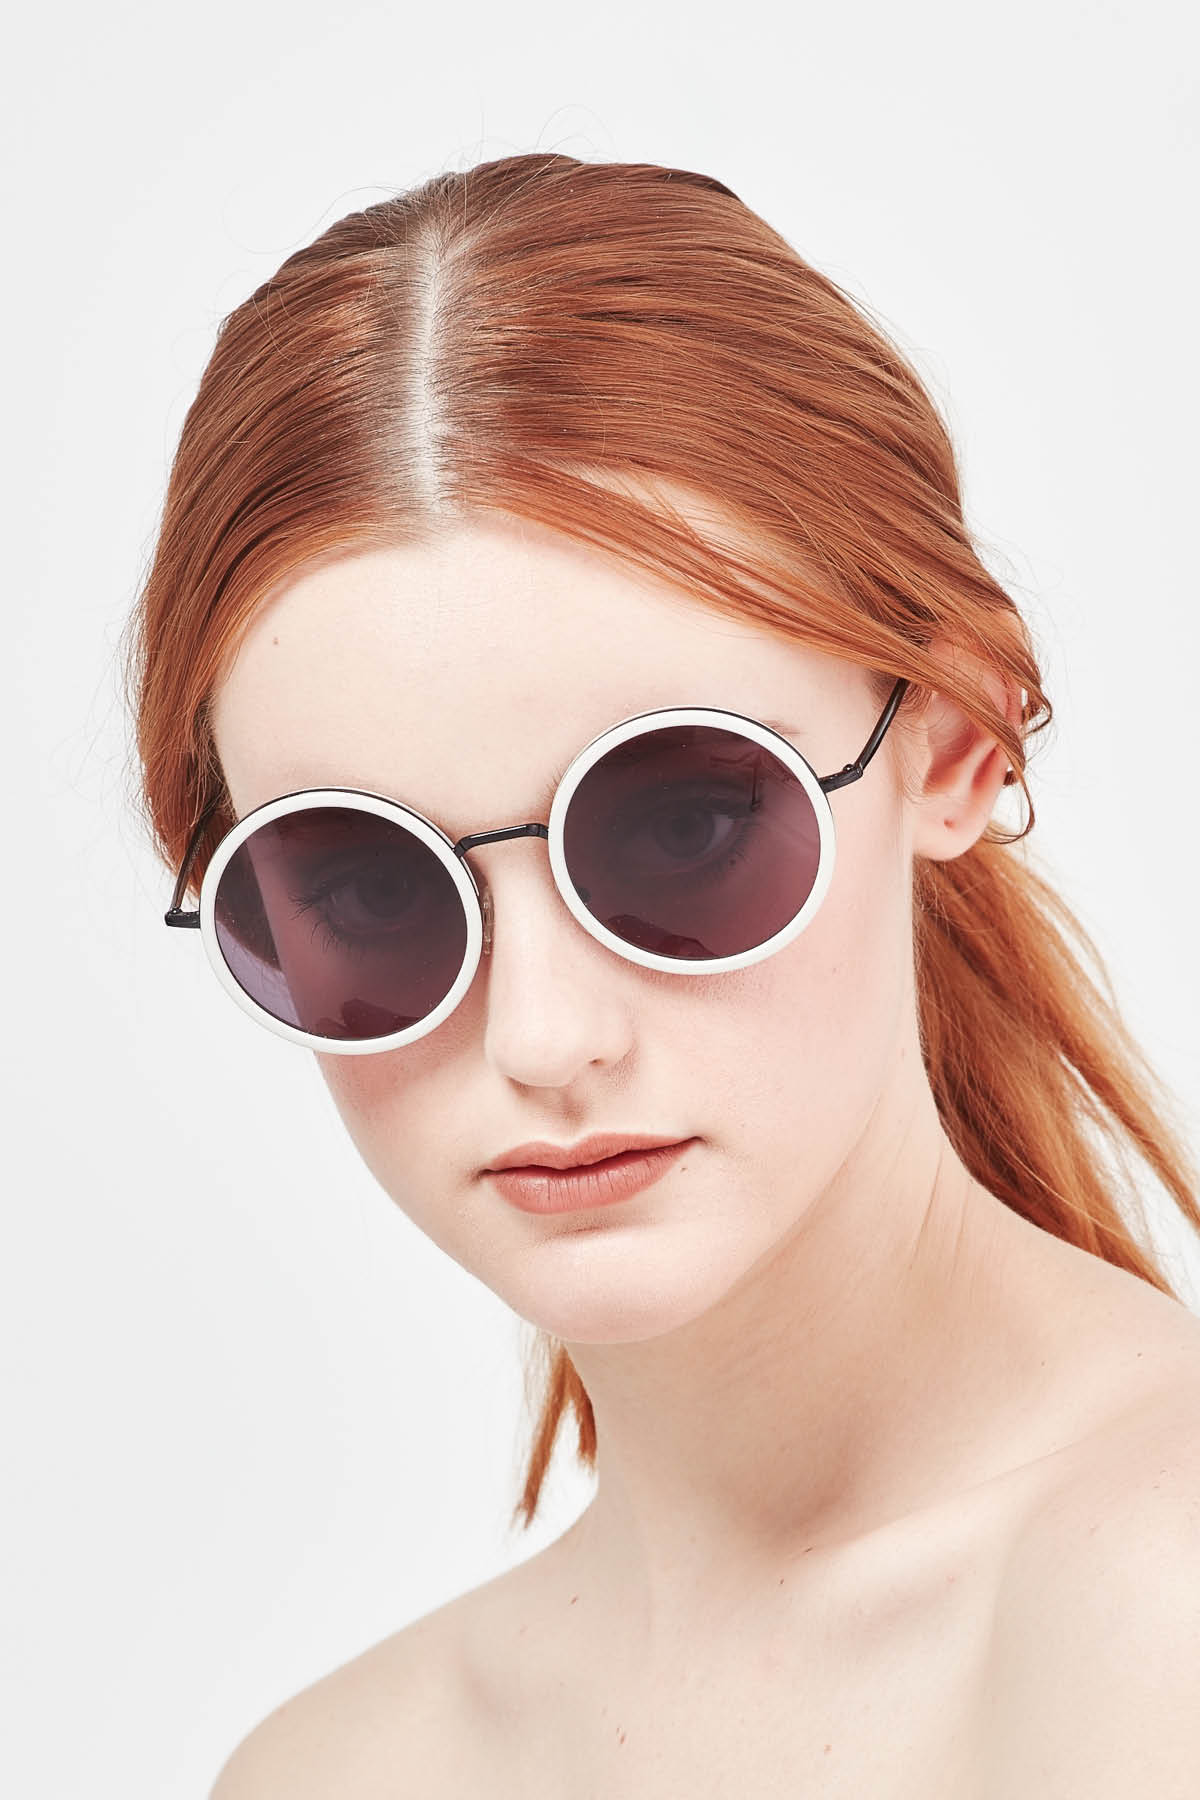 Trelise Cooper Slim Shady Sunglasses - Brand-Trelise Cooper